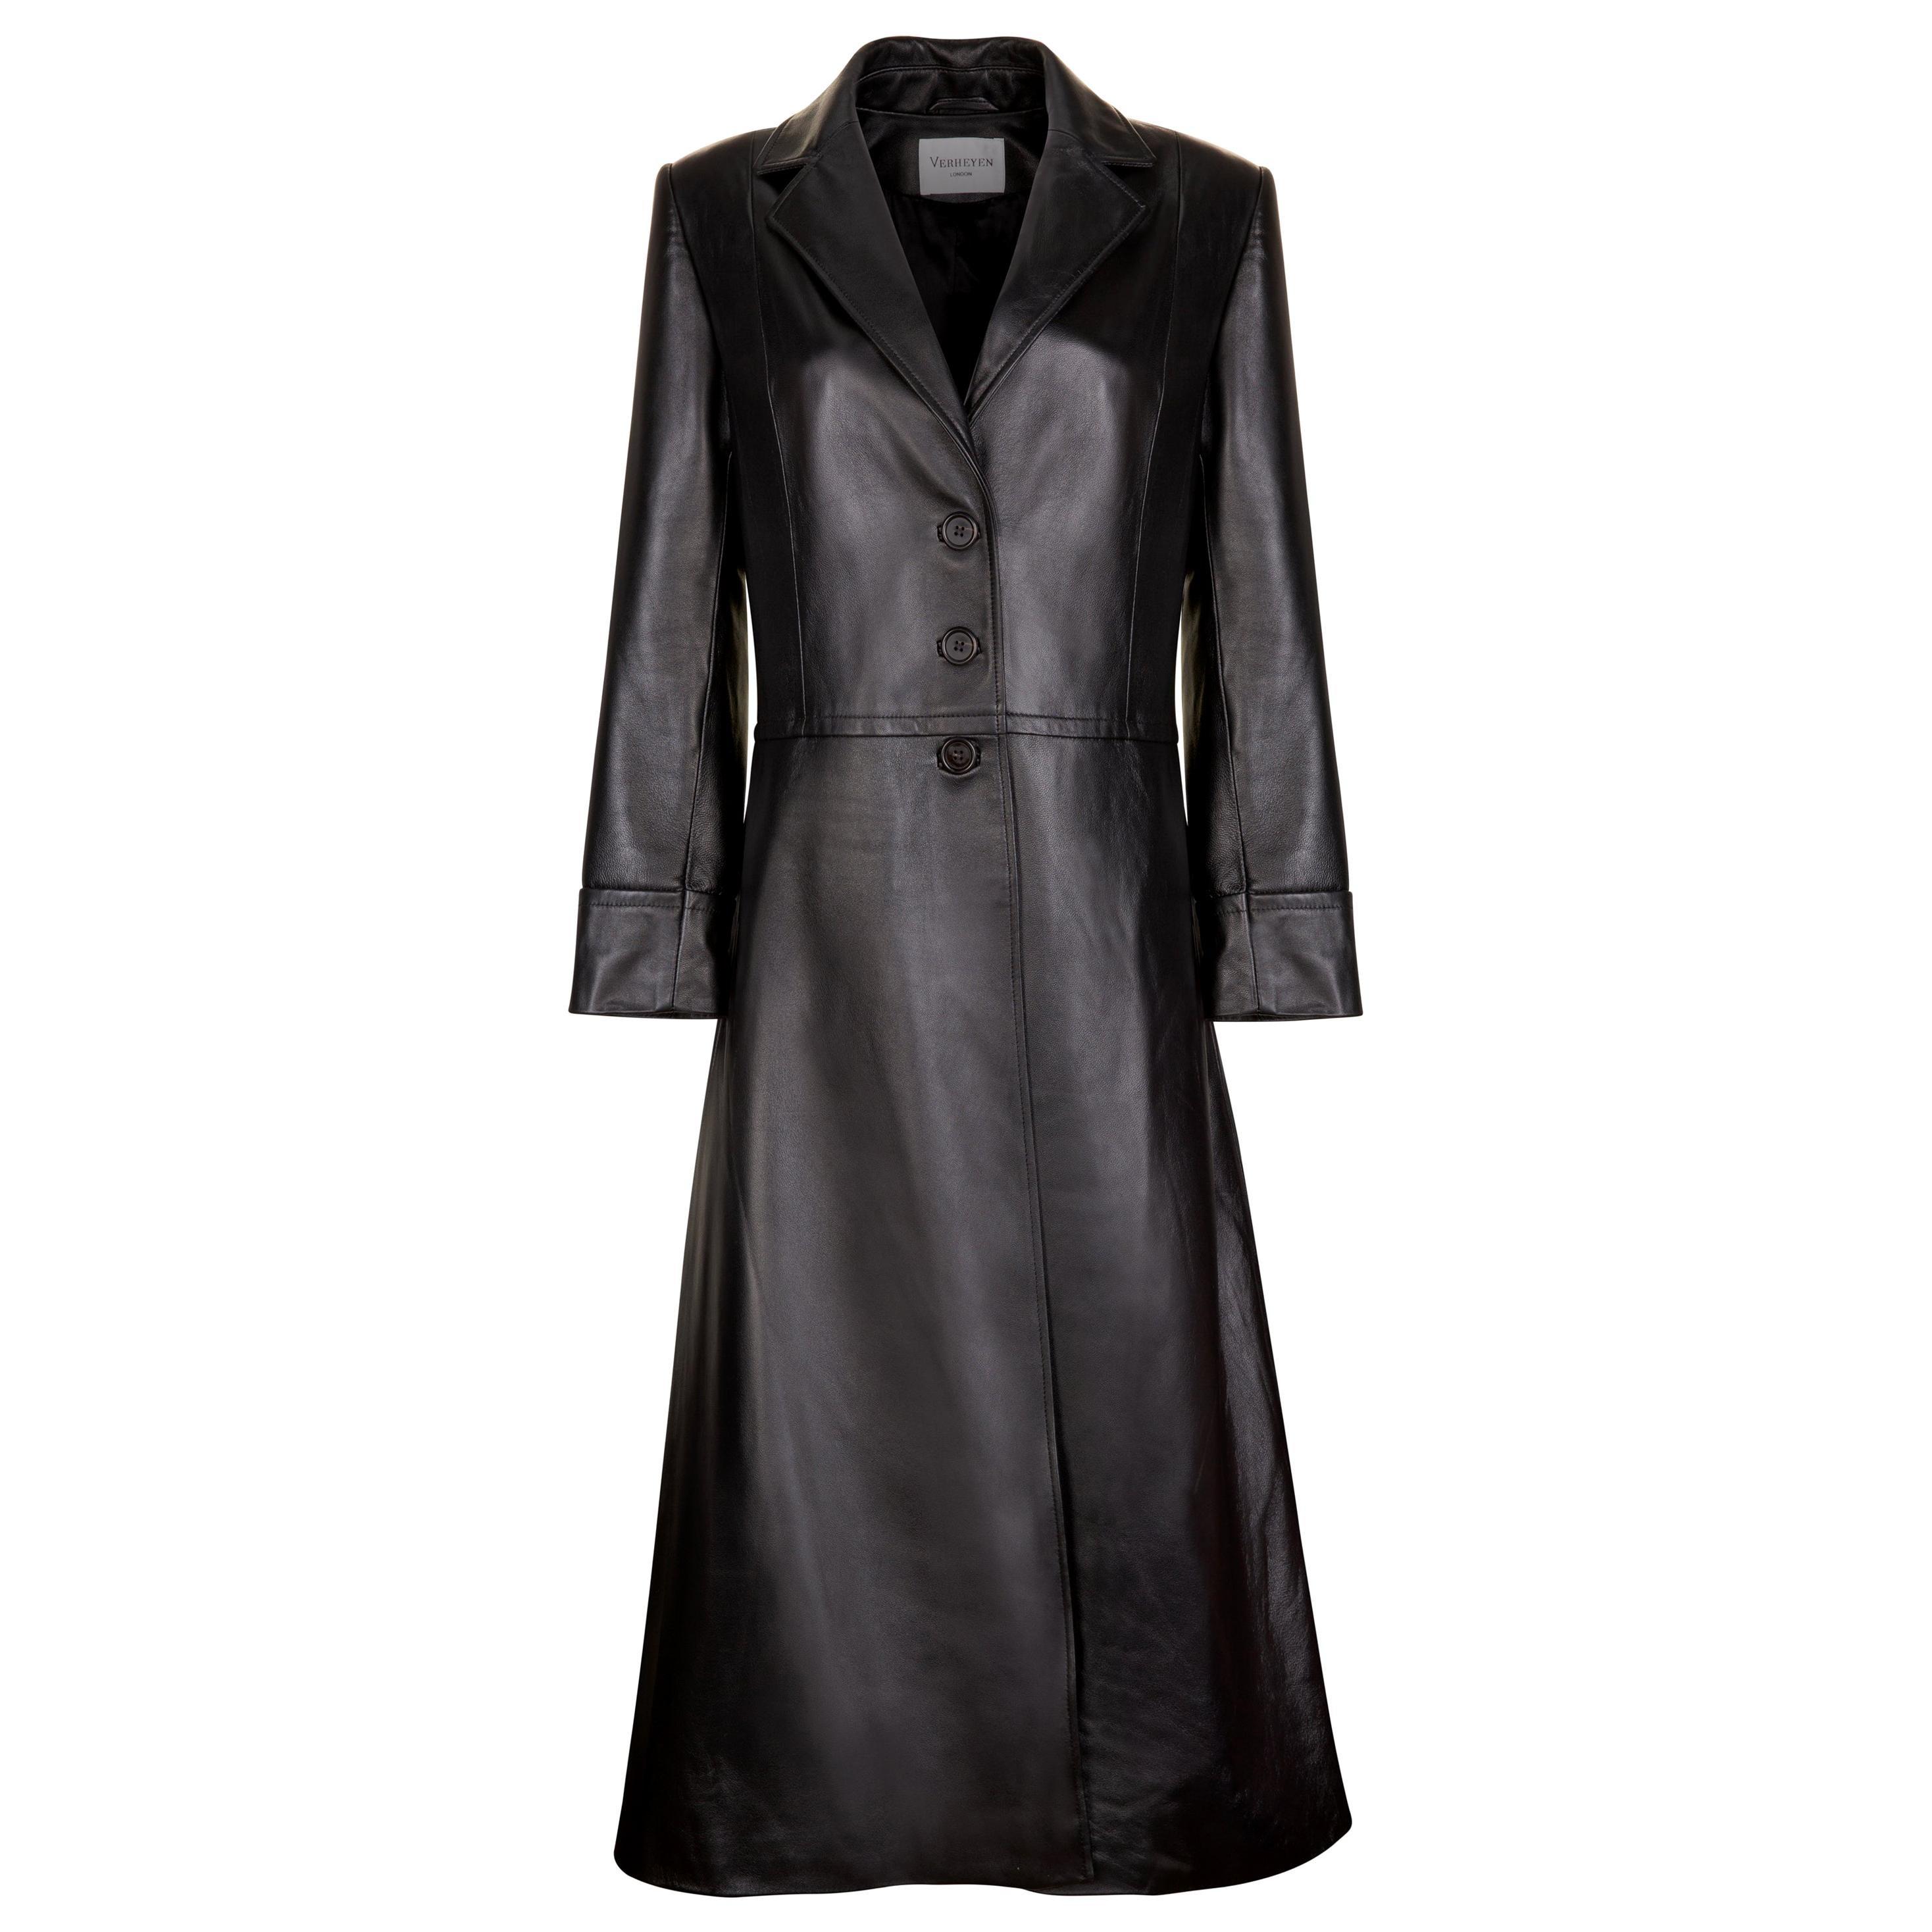 Verheyen London Oversize 70's Leather Trench Coat in Black - Size uk 12